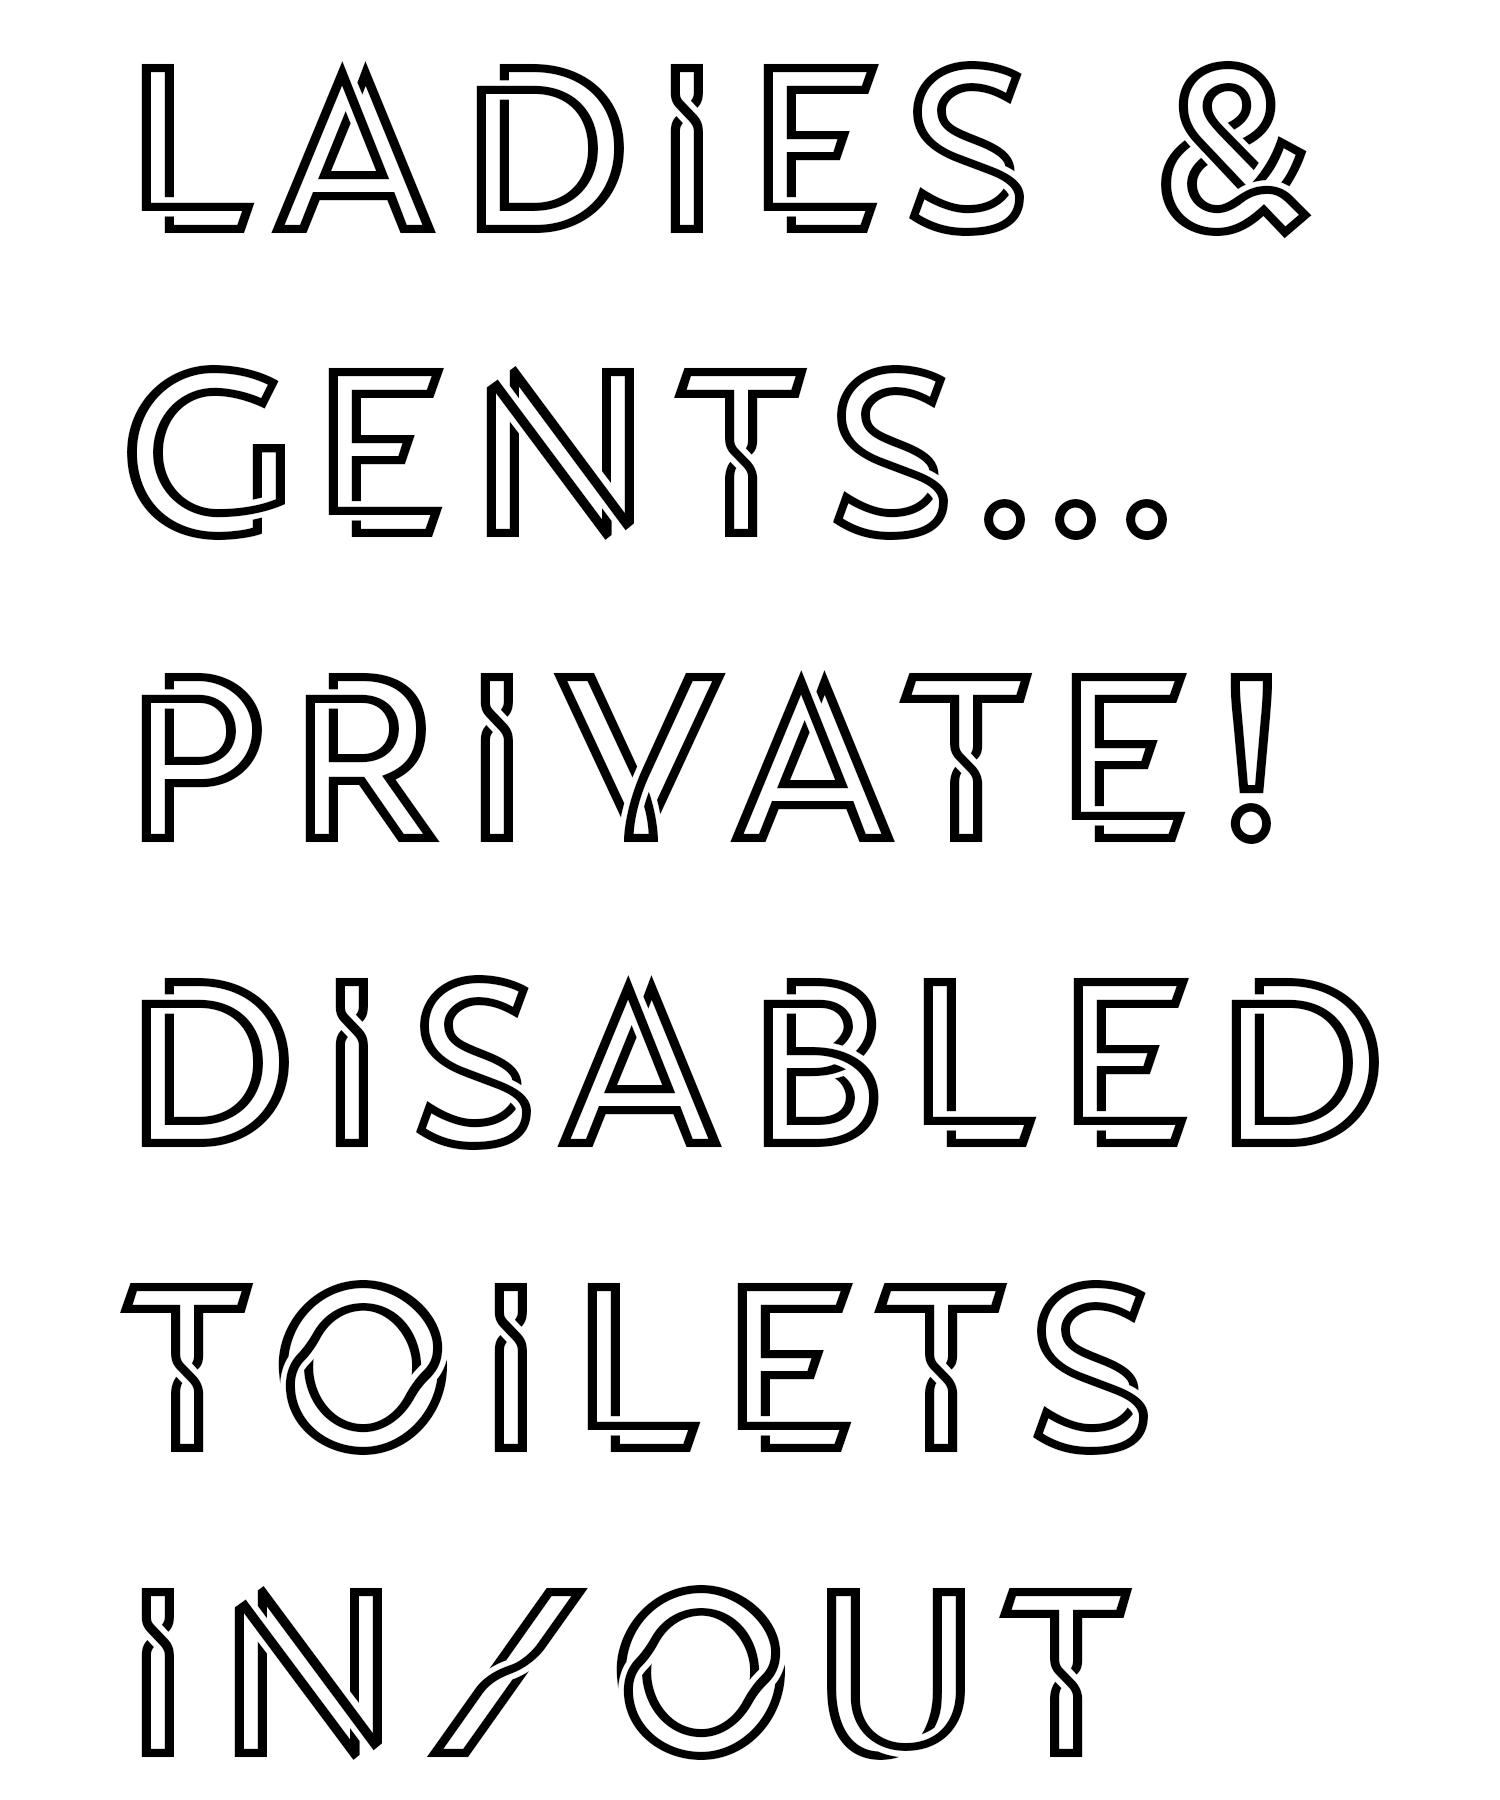 Sizzling Pubs bespoke font